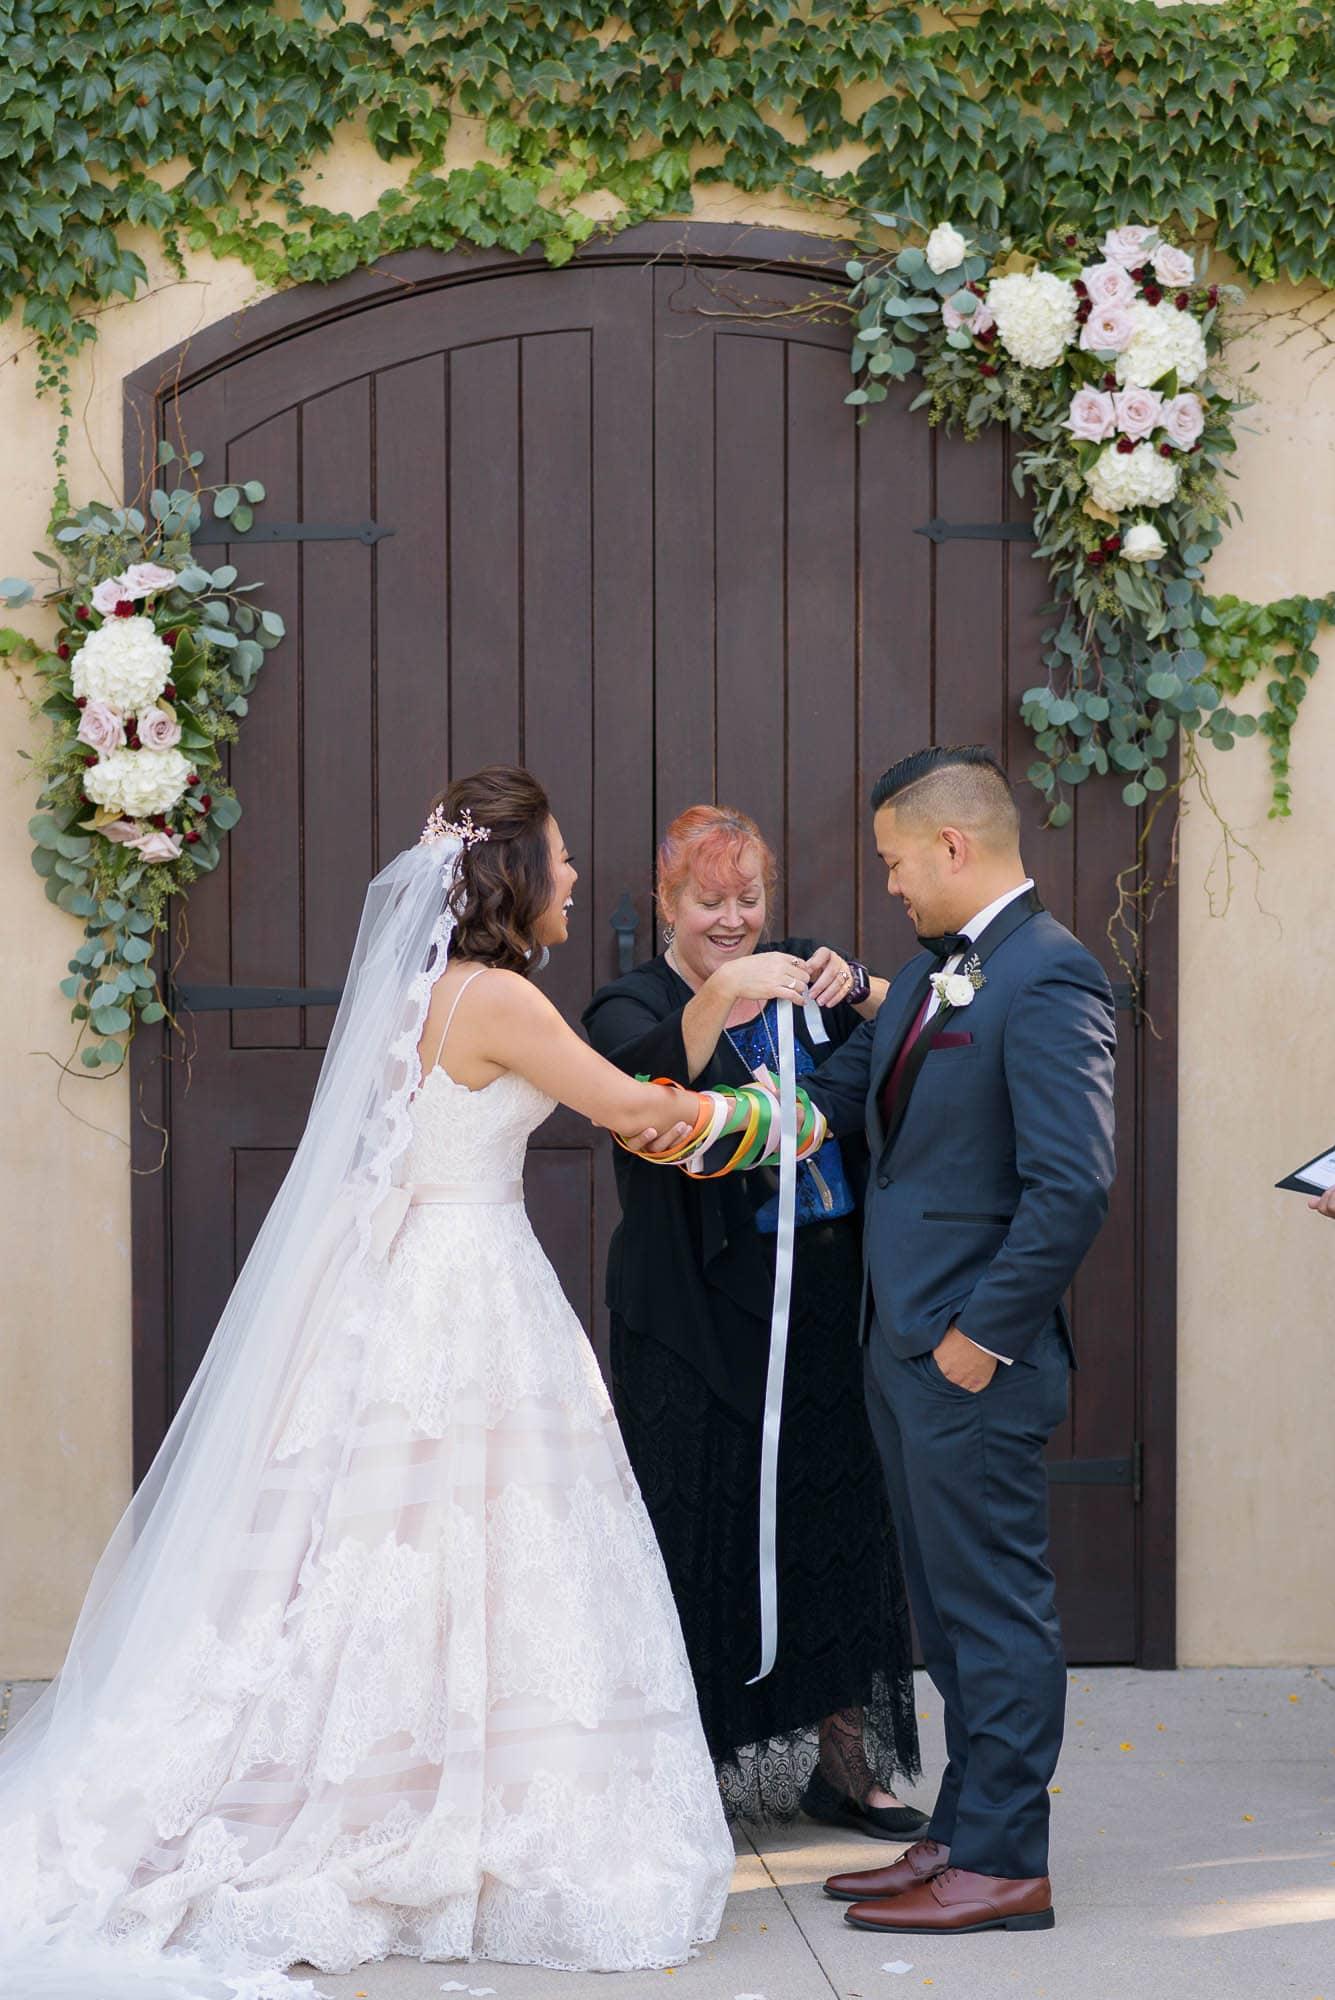 017_Alan_and_Heidi_Wedding_Karla_Paolo